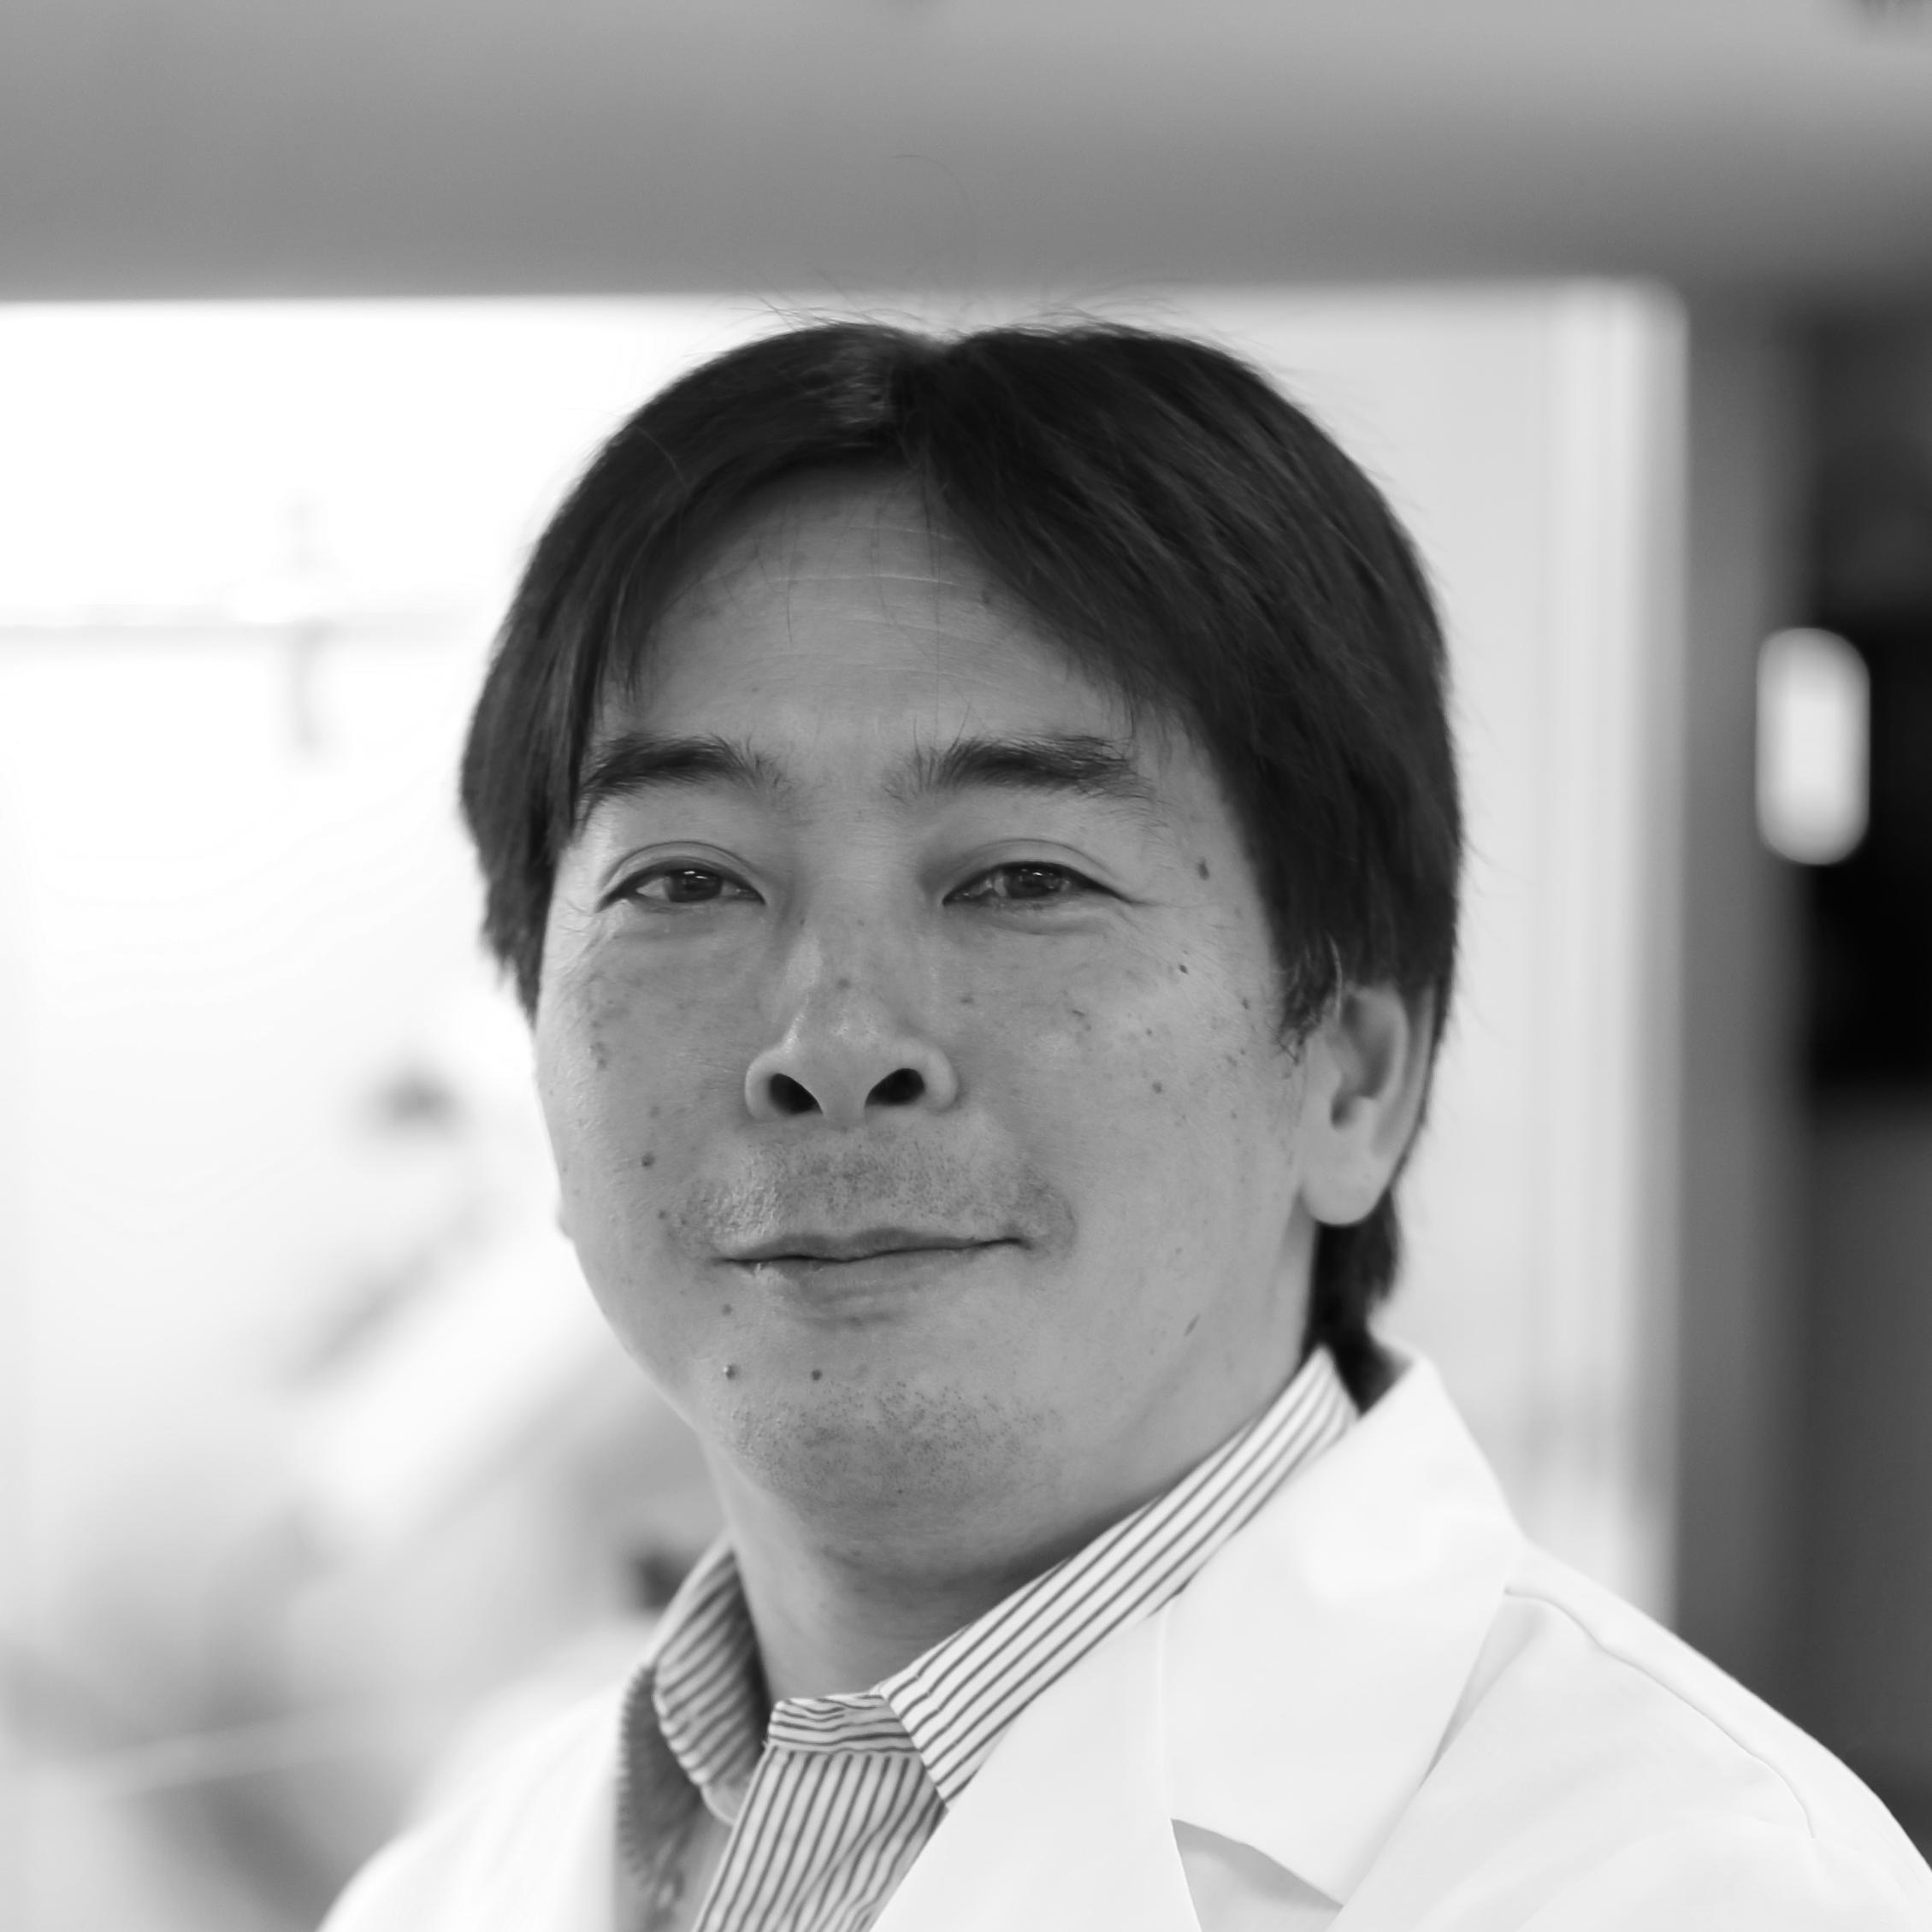 headshot of Abwiz scientist Yasu